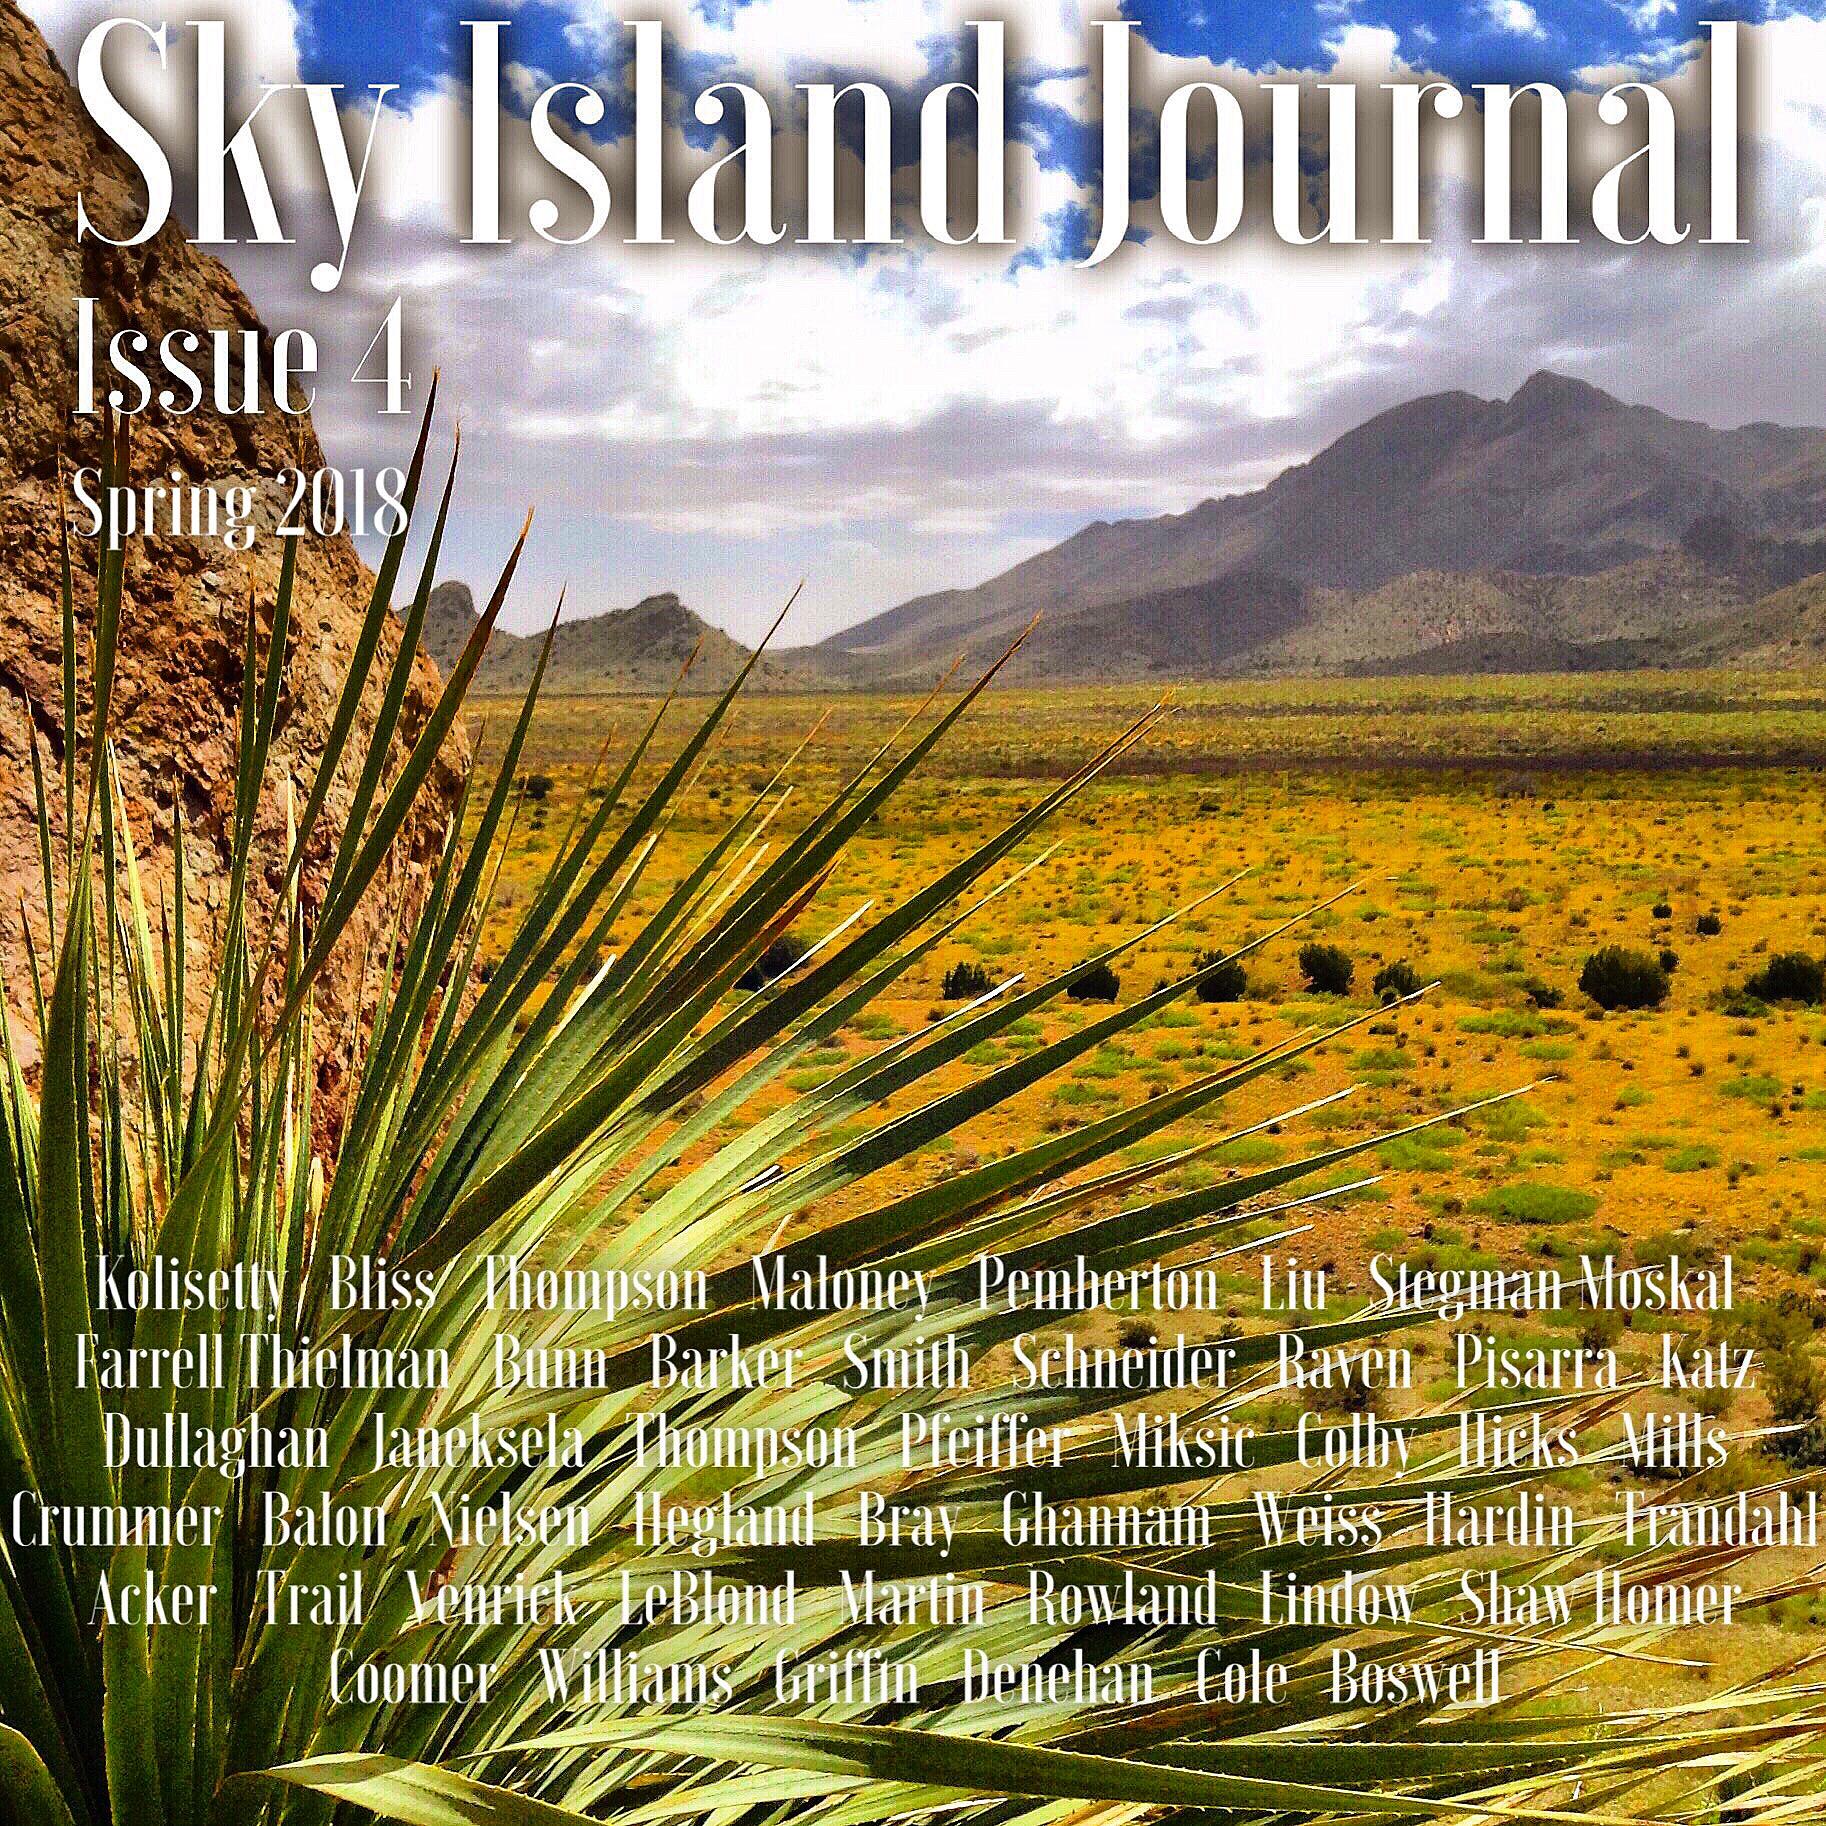 Sky Island Journal_Issue 4.jpeg